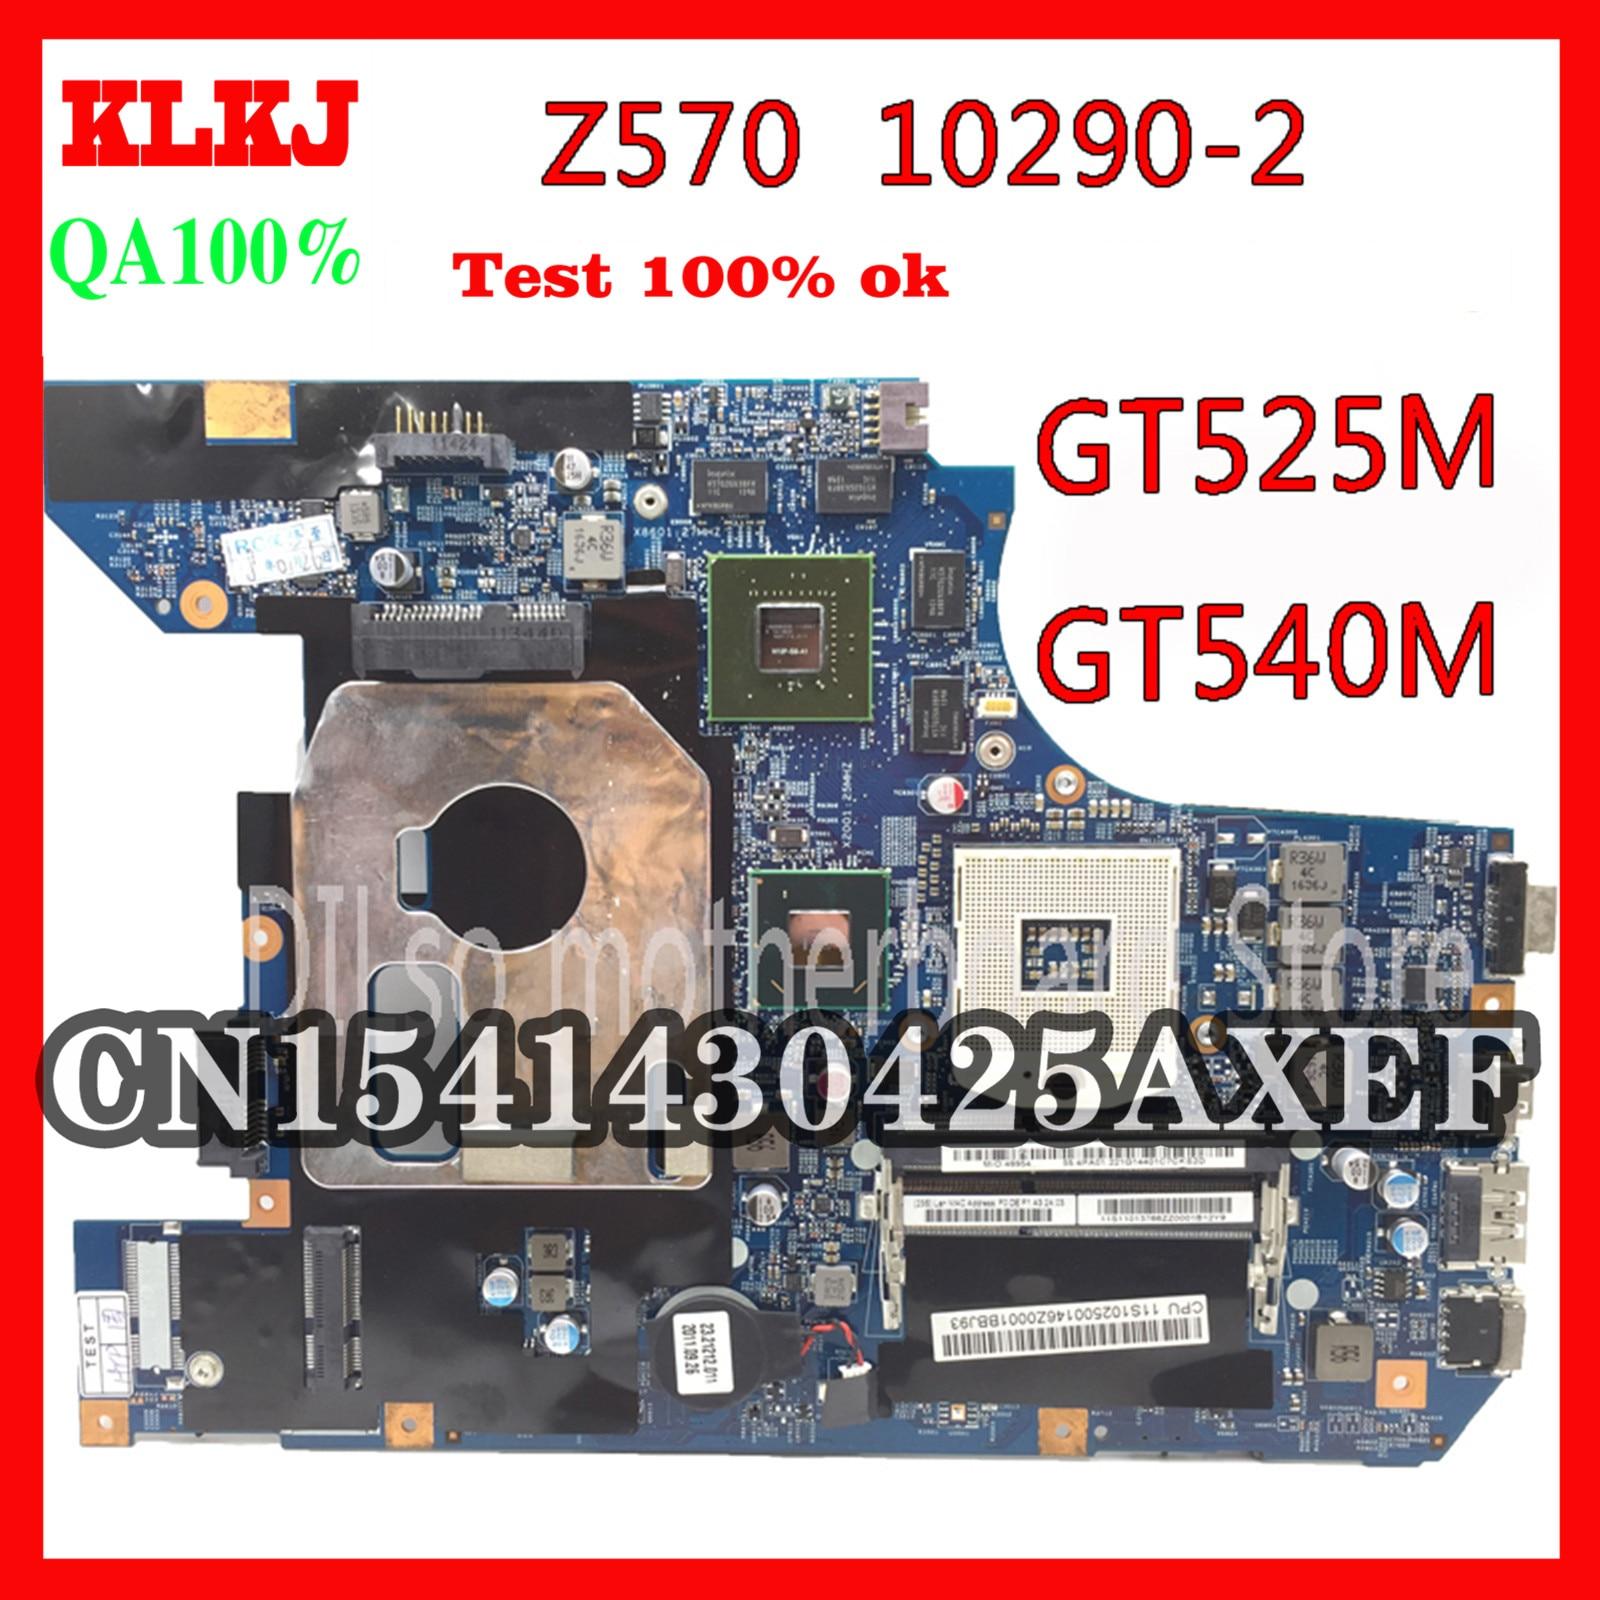 KLKJ 10290-2 LZ57 MB اللوحة الأم الأصلية لينوفو Z570 اللوحة الأم Z570 اللوحة GT540M/GT525M اختبار